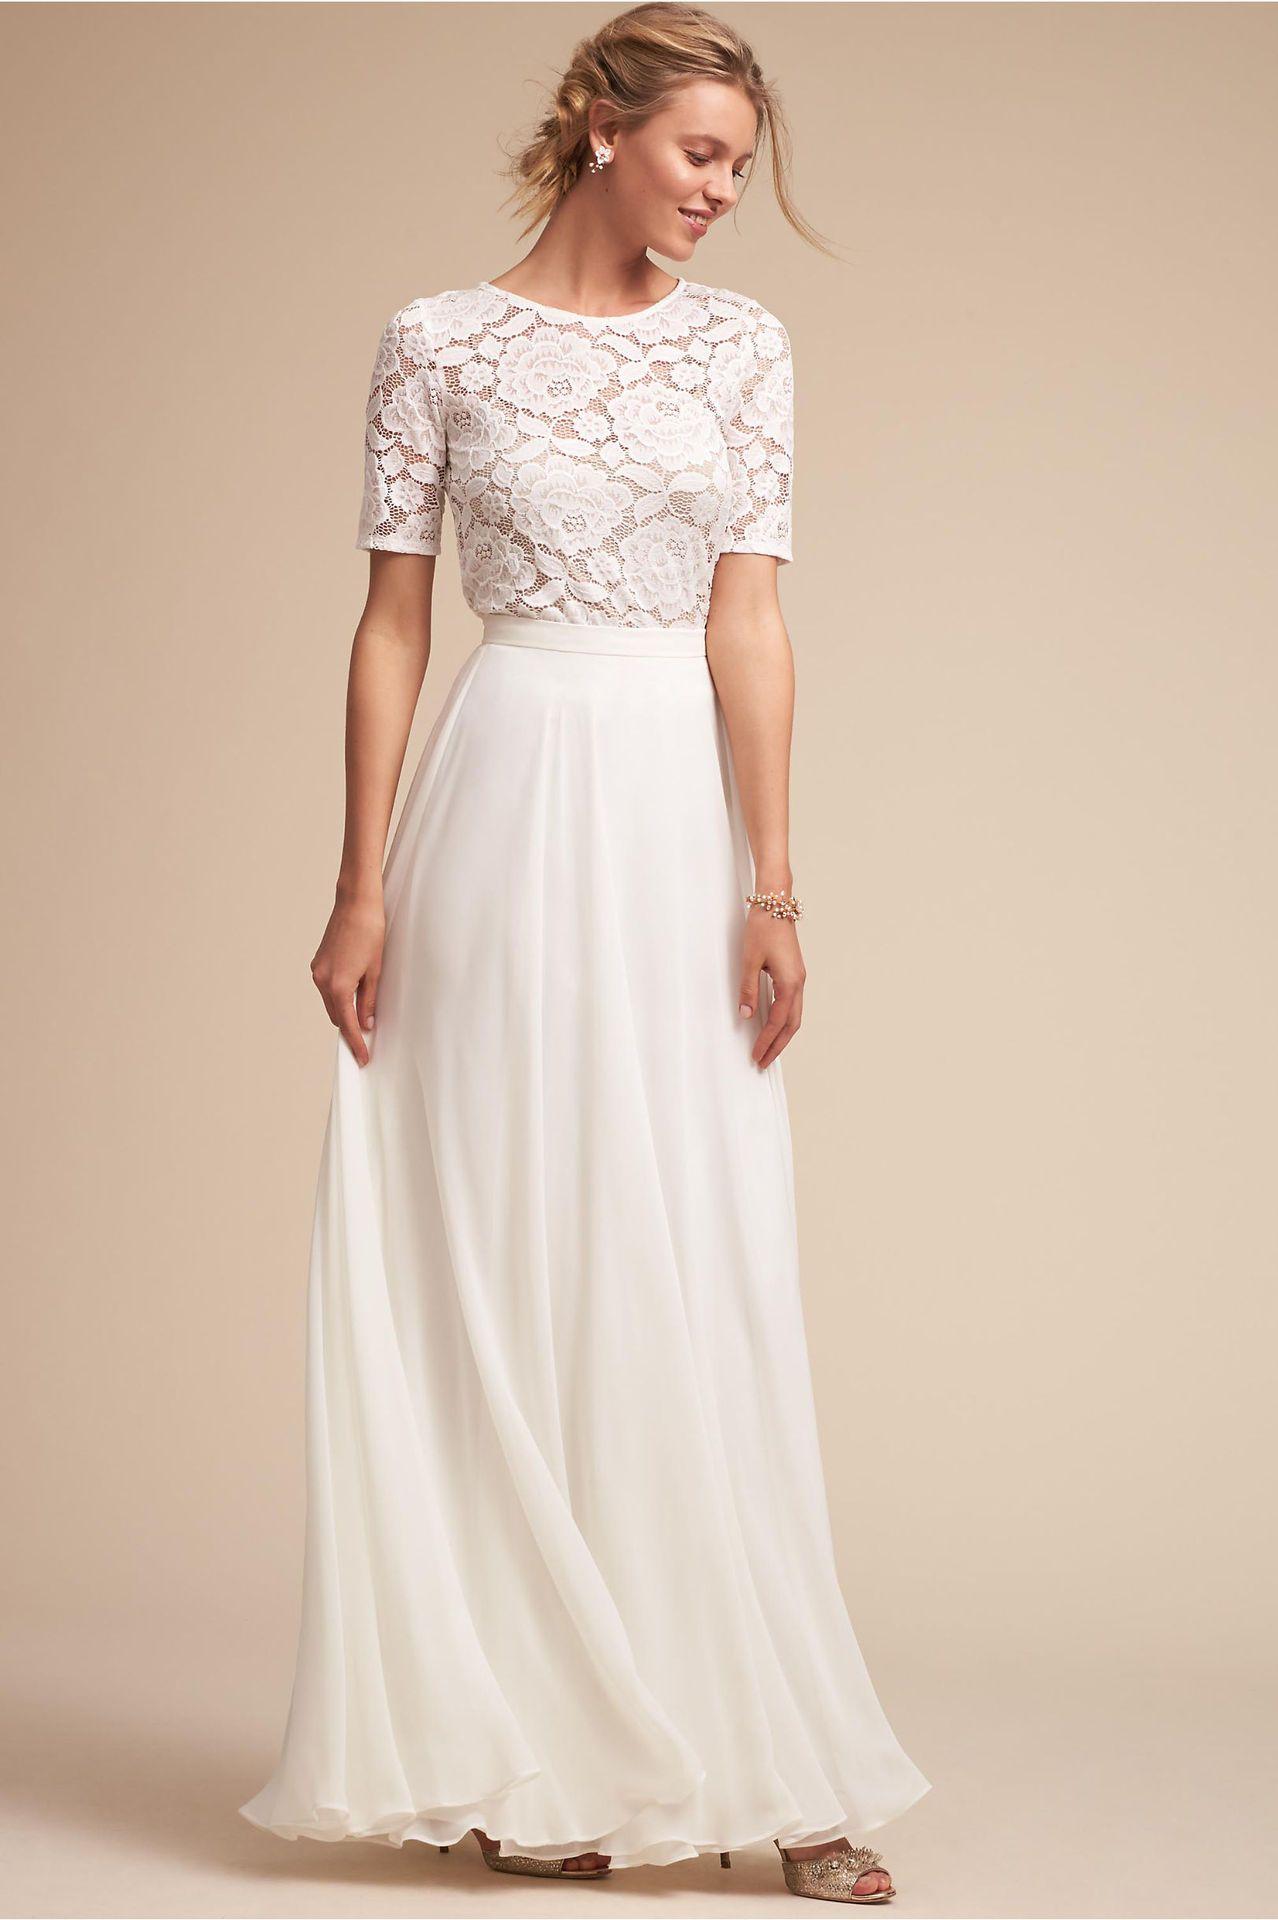 Short White Maxi Dresses